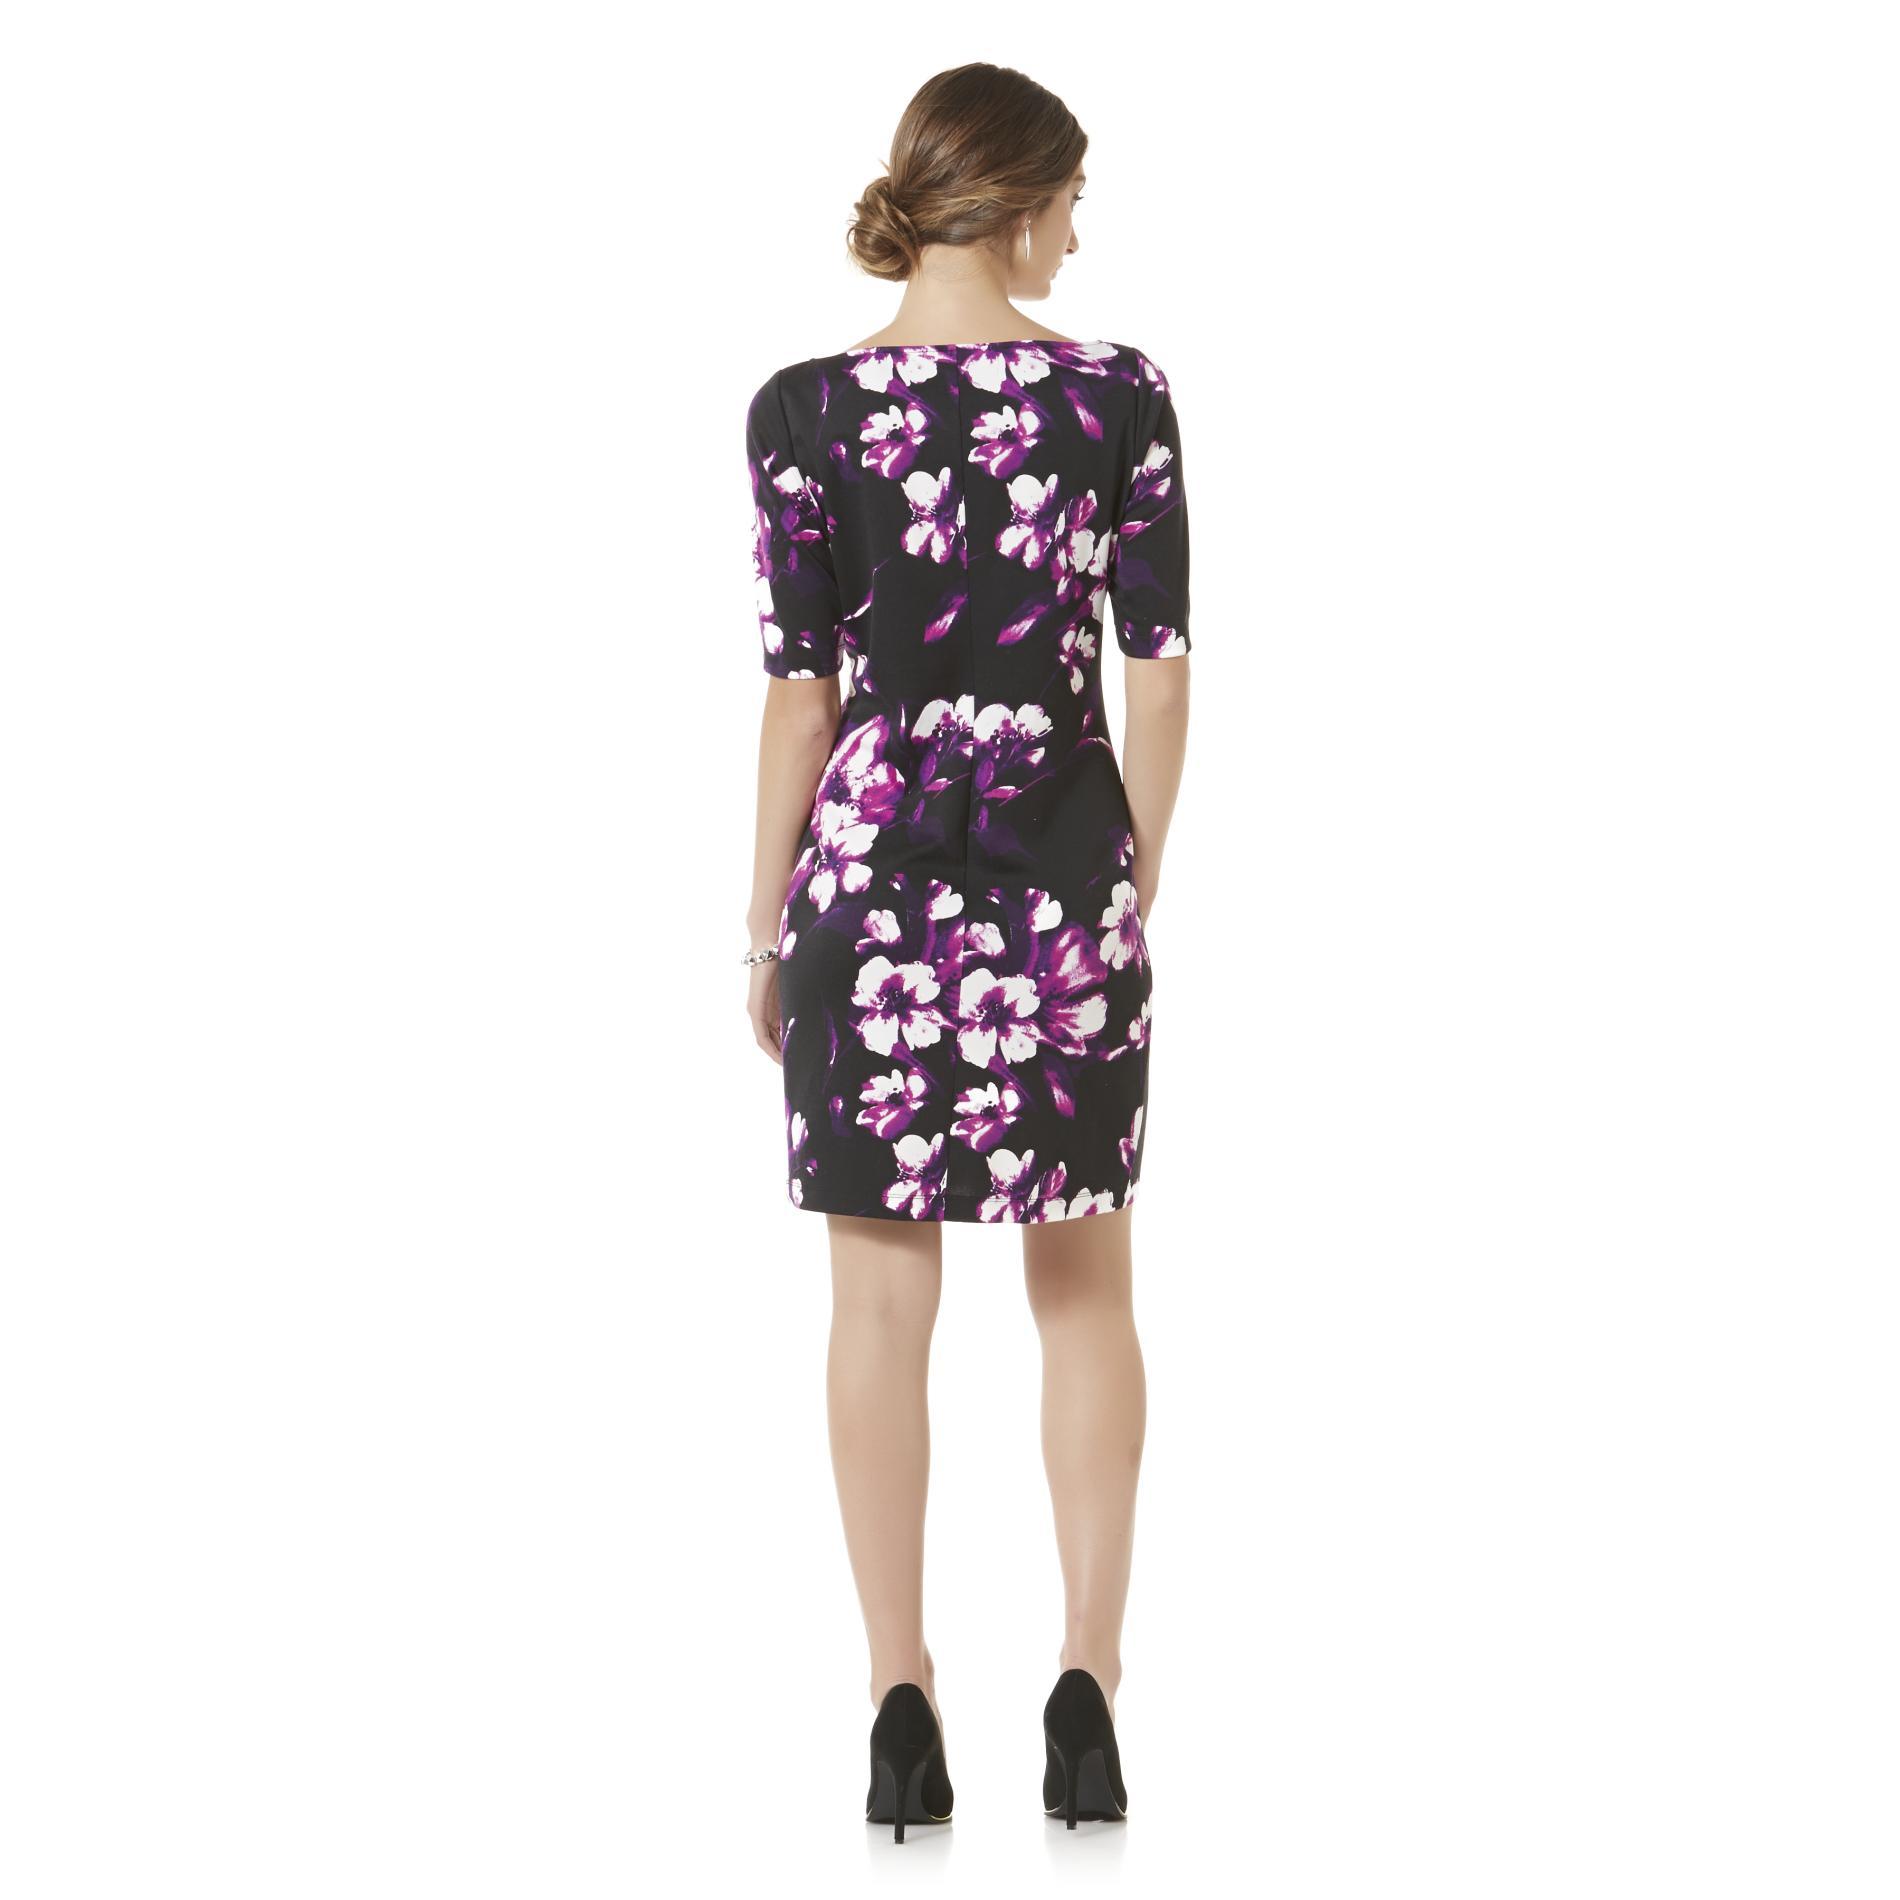 Metaphor Women's Sheath Dress - Floral